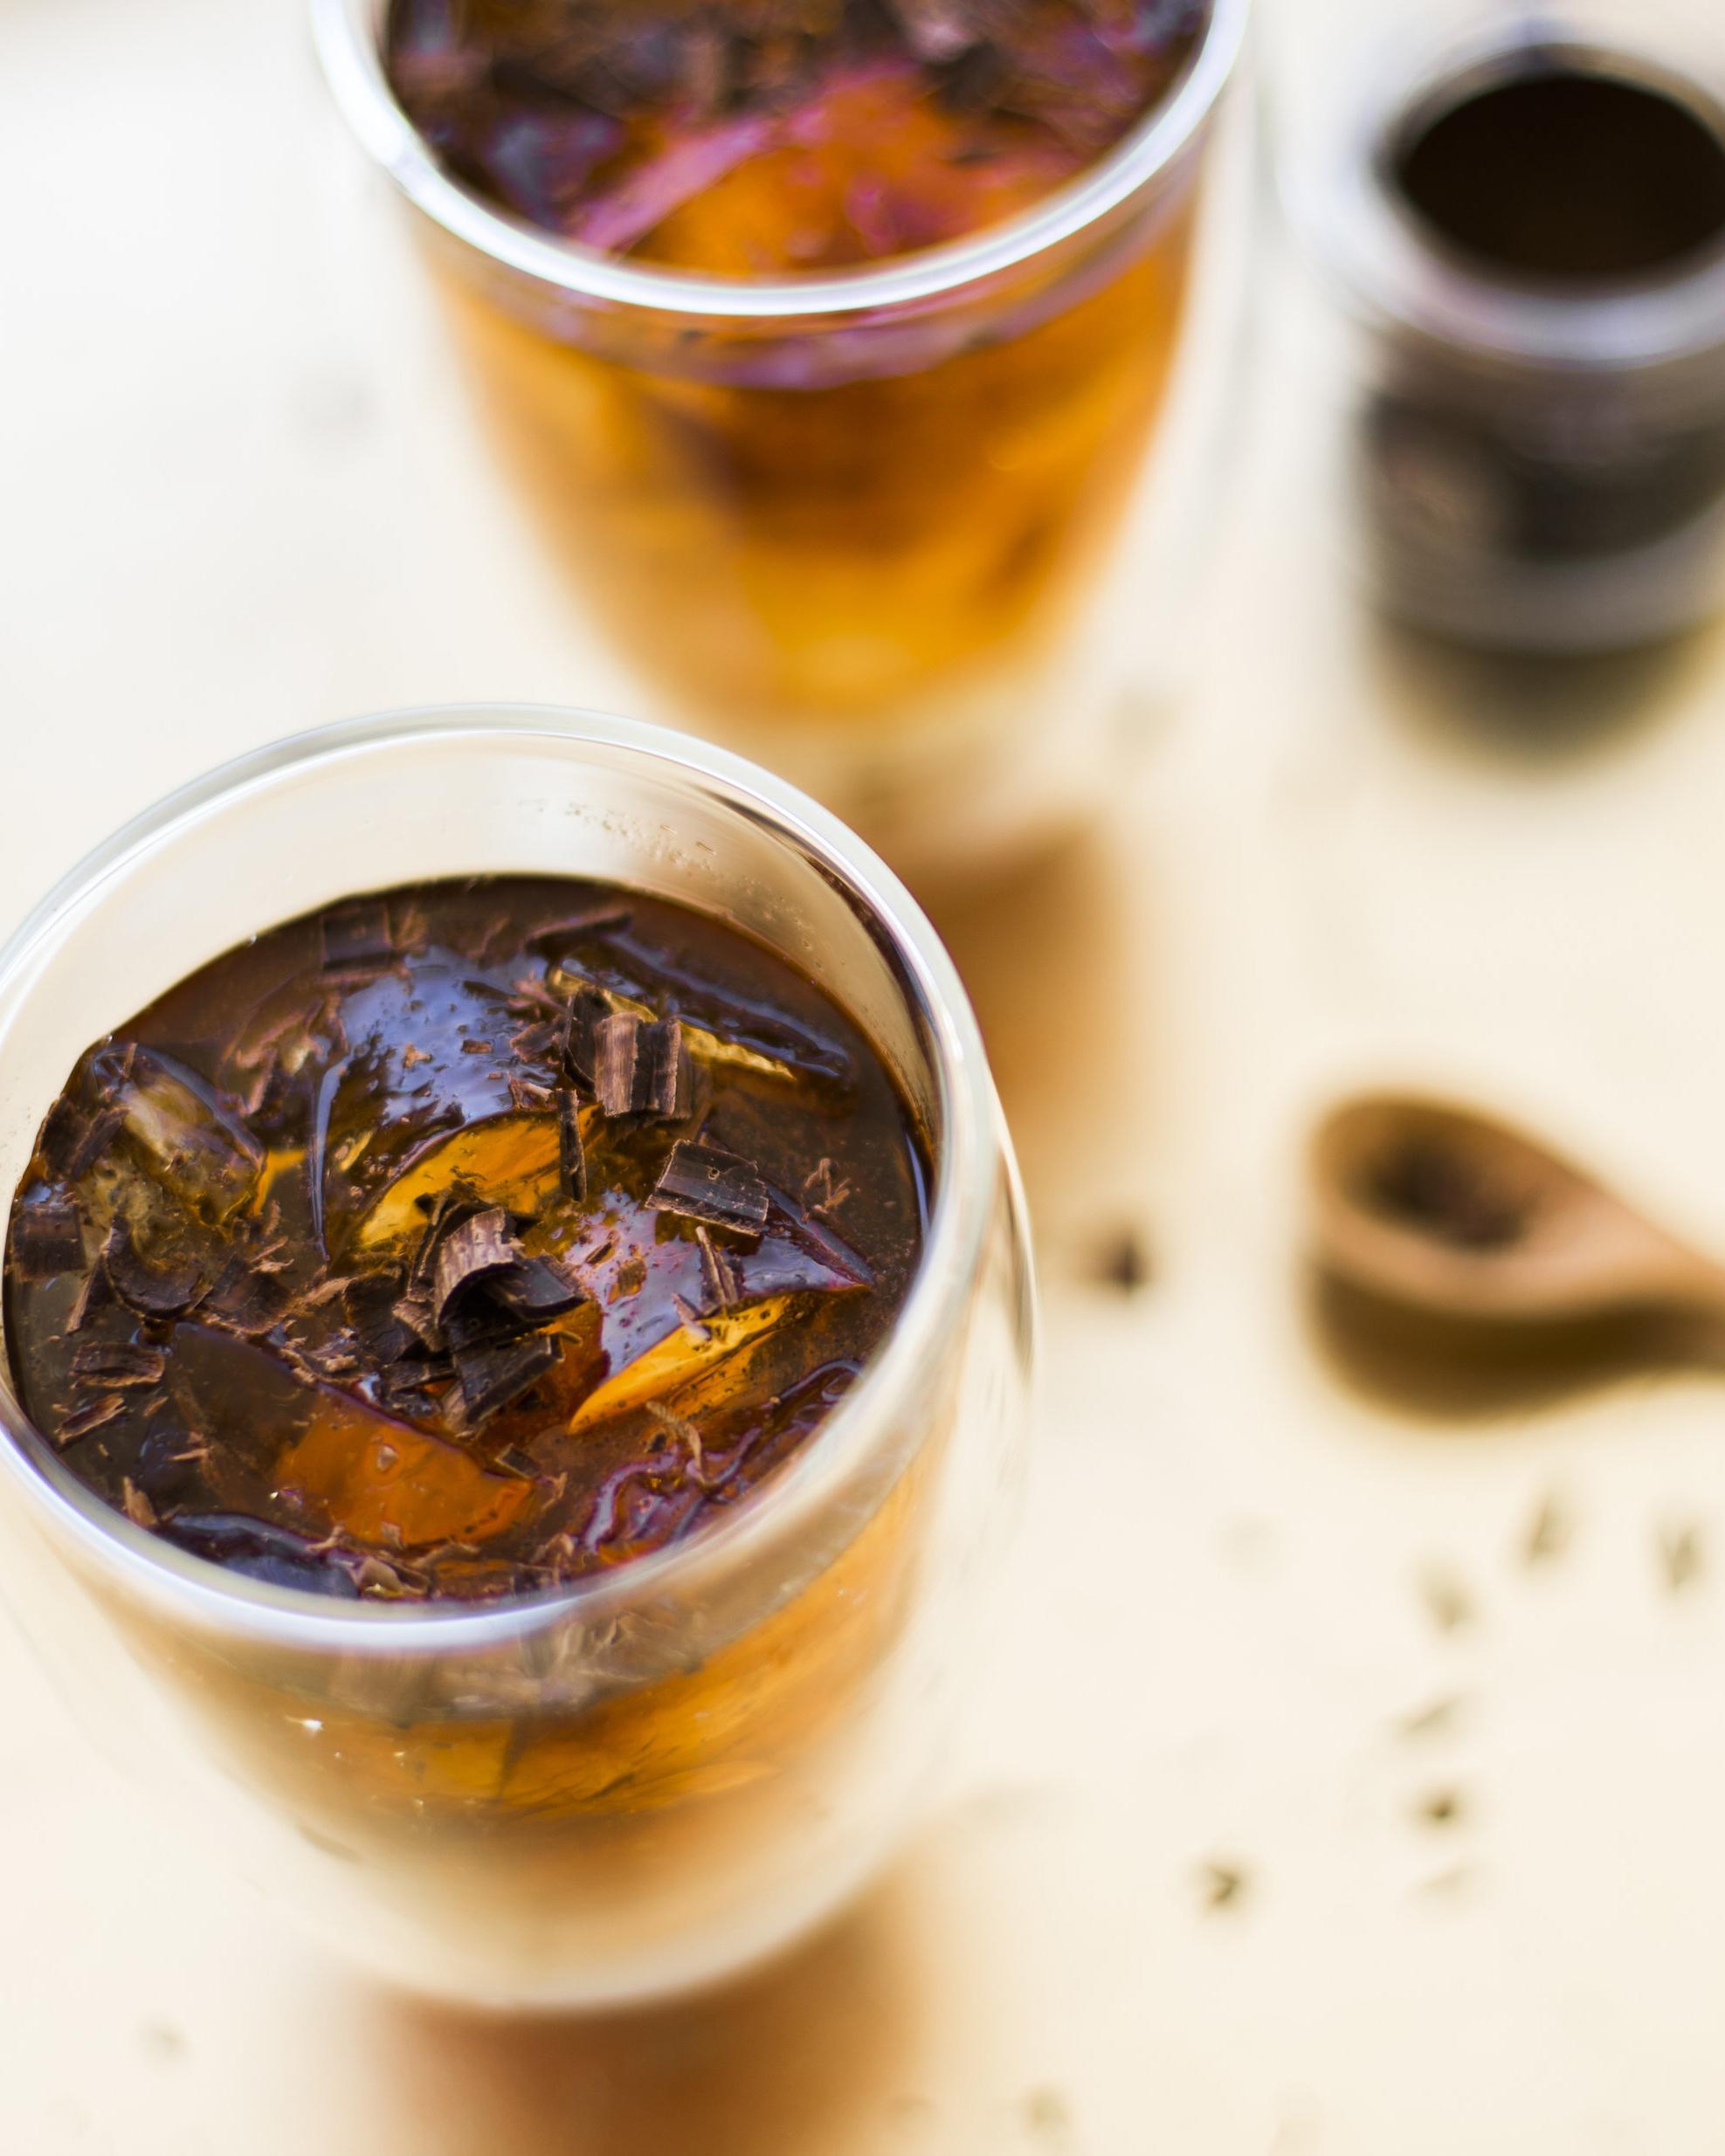 UNCOMMON GROUND   cold pressed coffee, house vanilla syrup, chocolate & Angostura bitters, bourbon